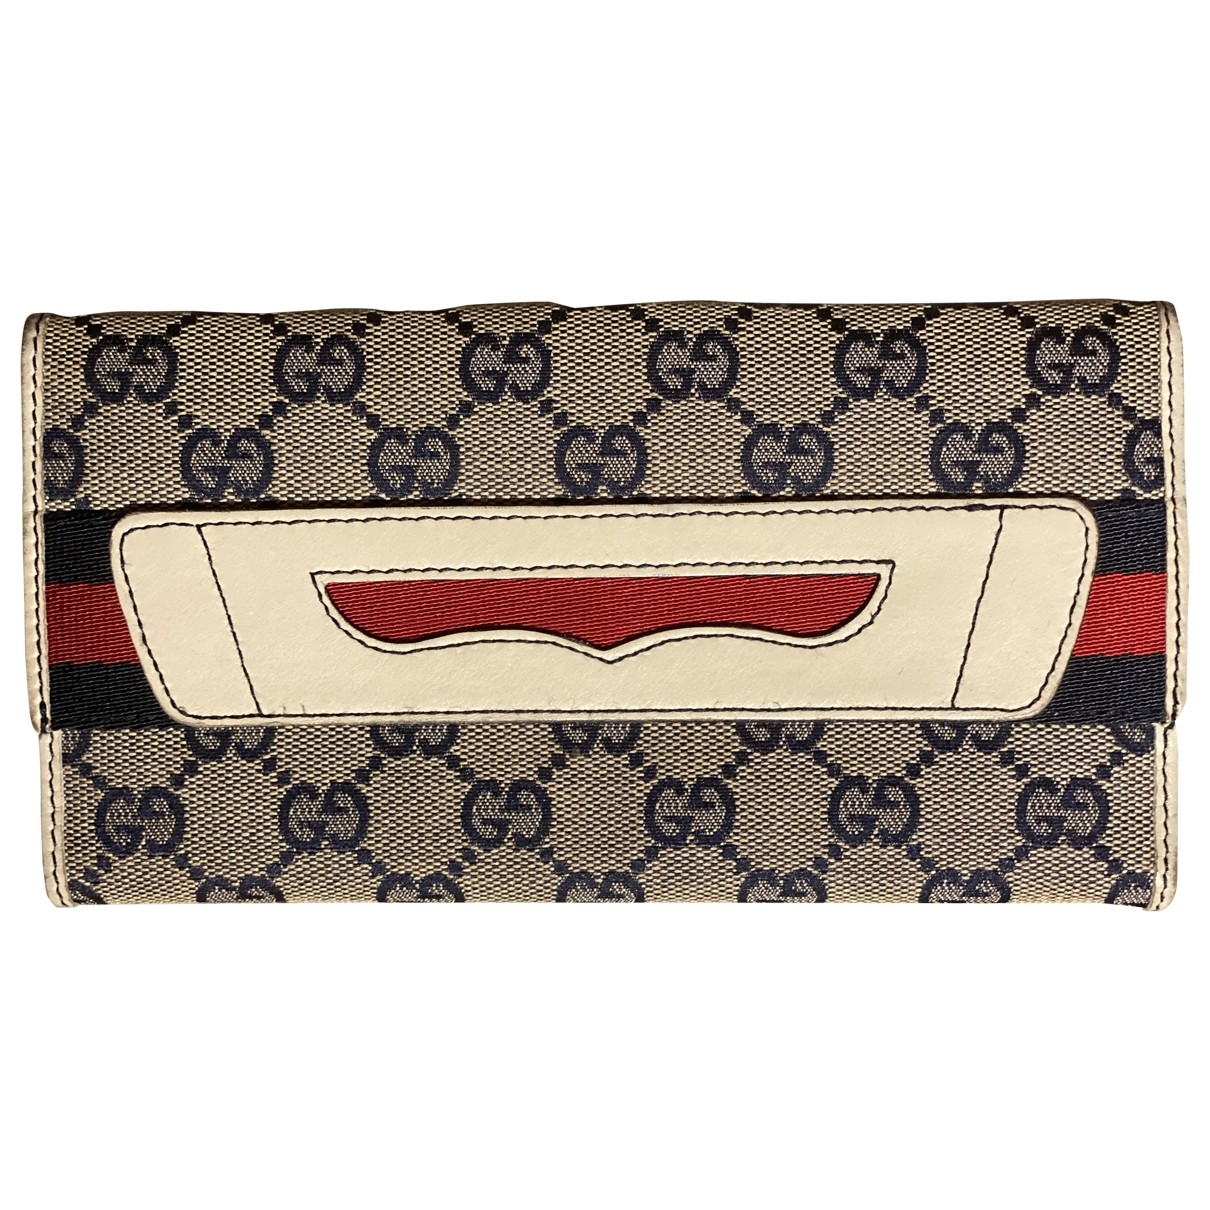 Gucci \N Multicolour Cloth wallet for Women \N